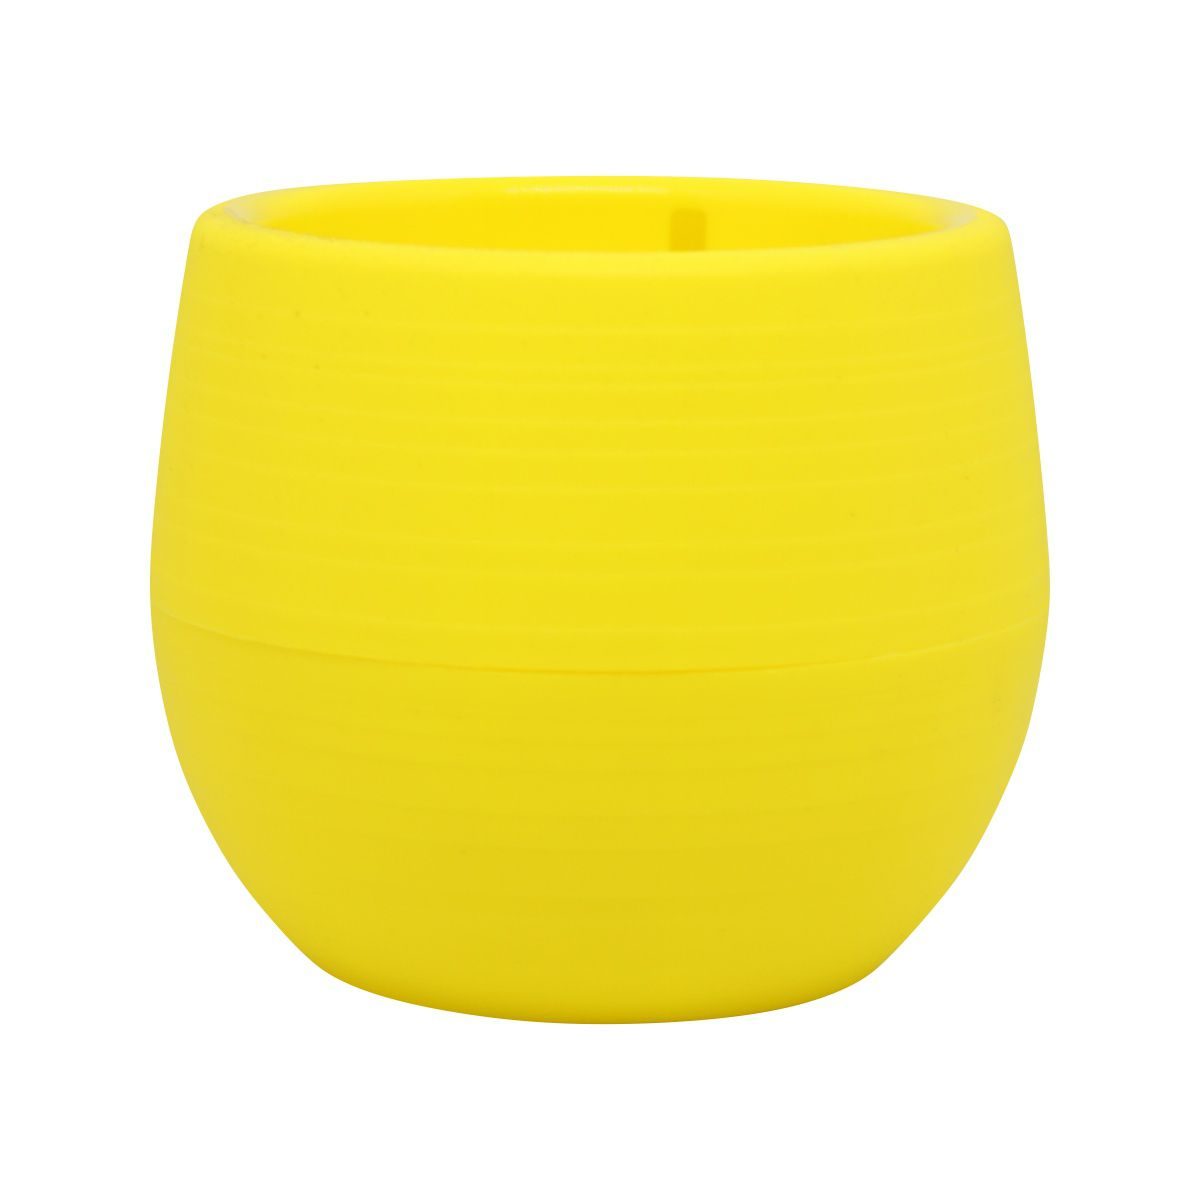 Vaso Babyball Amarelo 7cm x 7cm